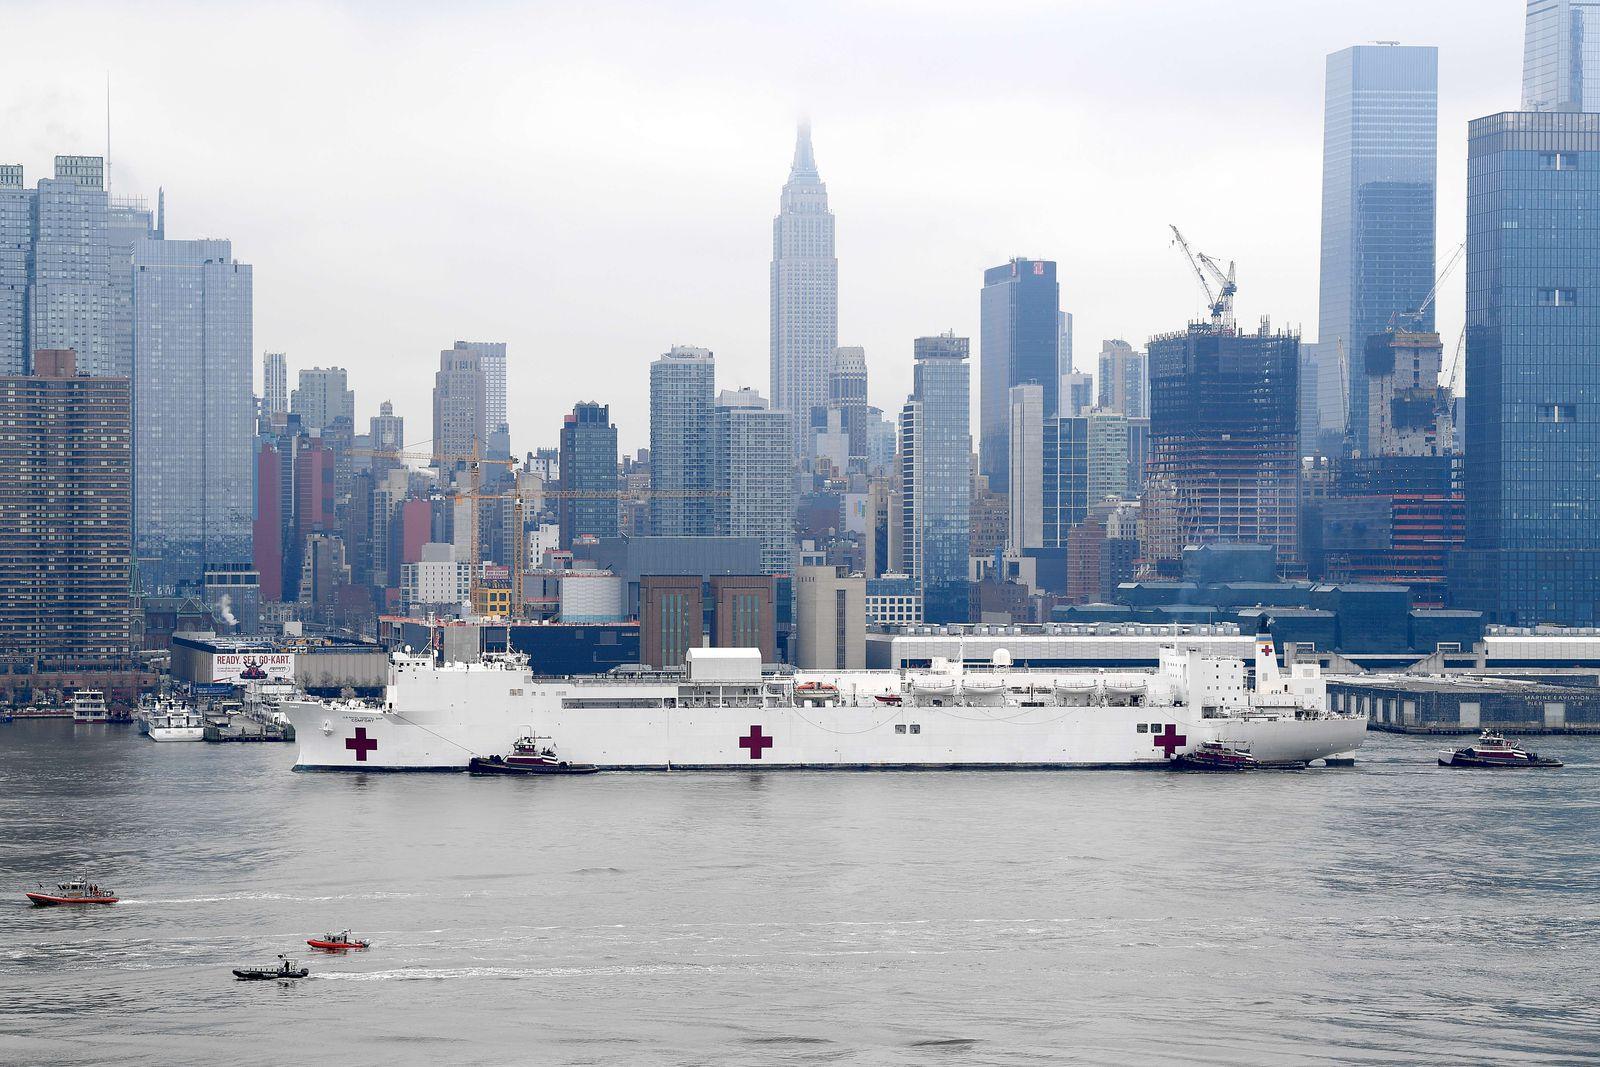 Hospital Ship USNS Comfort Arrives In New York As Coronavirus Overwhelms Medical Infrastructure